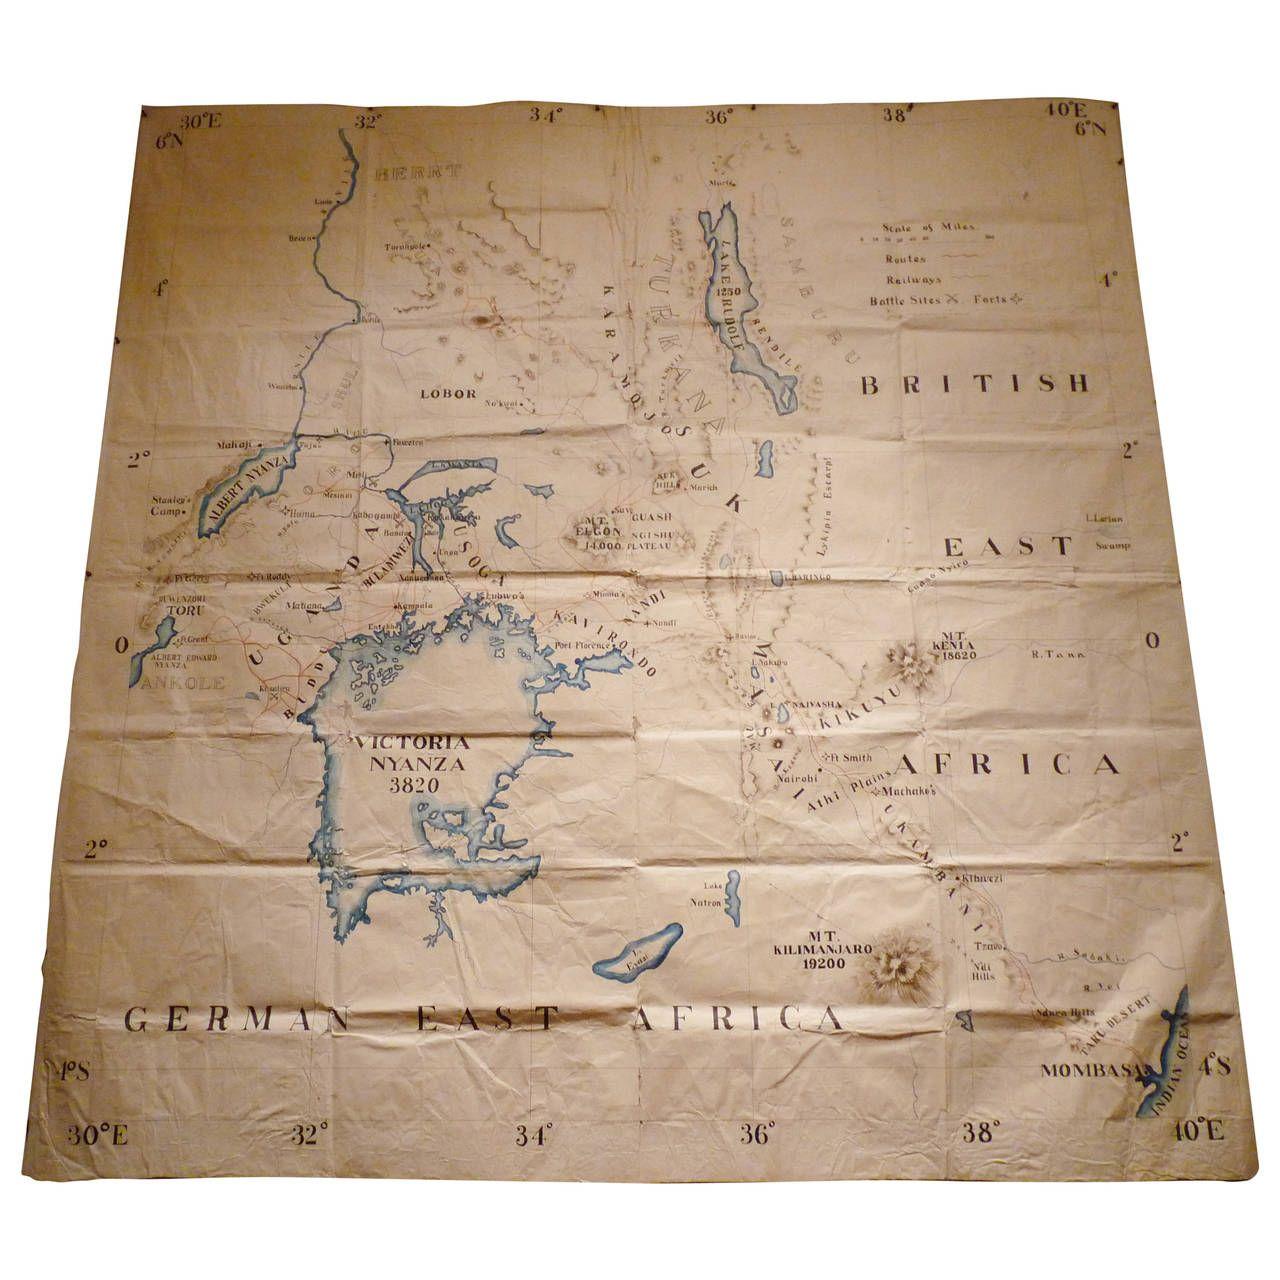 Map Of East Africa 1stdibs Com Vintage Maps Modern Map Map